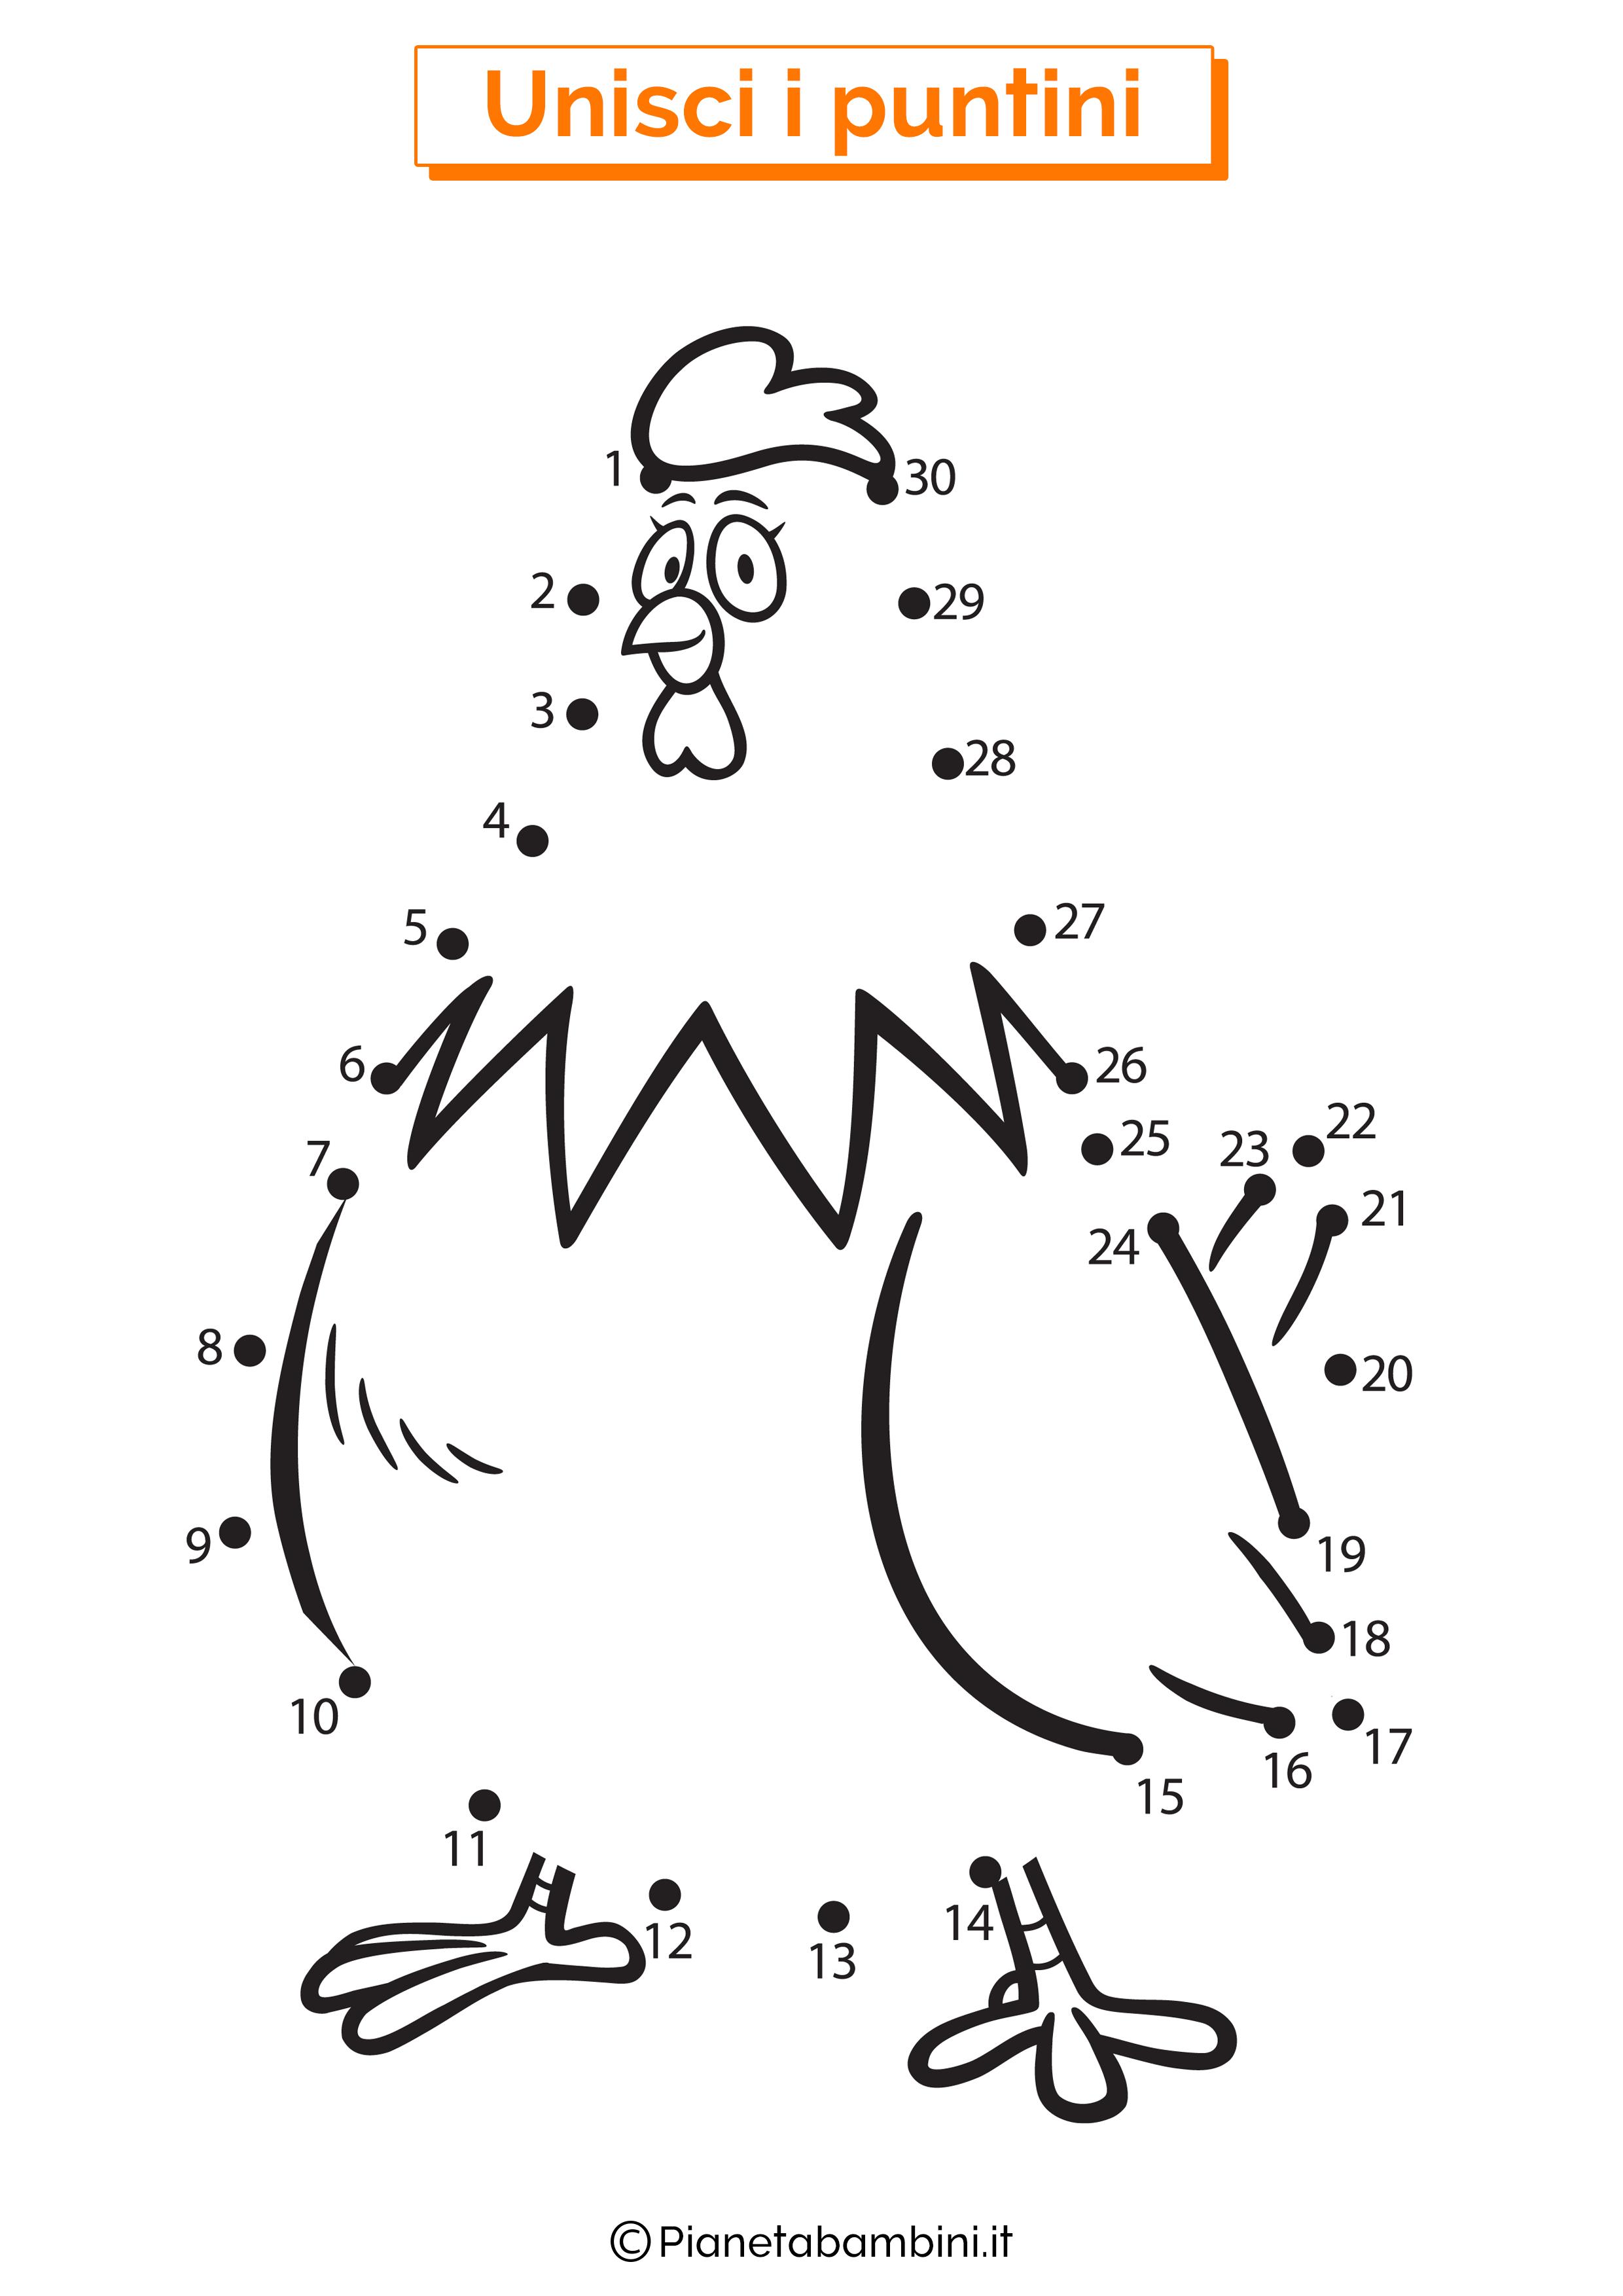 Disegno unisci i puntini gallina